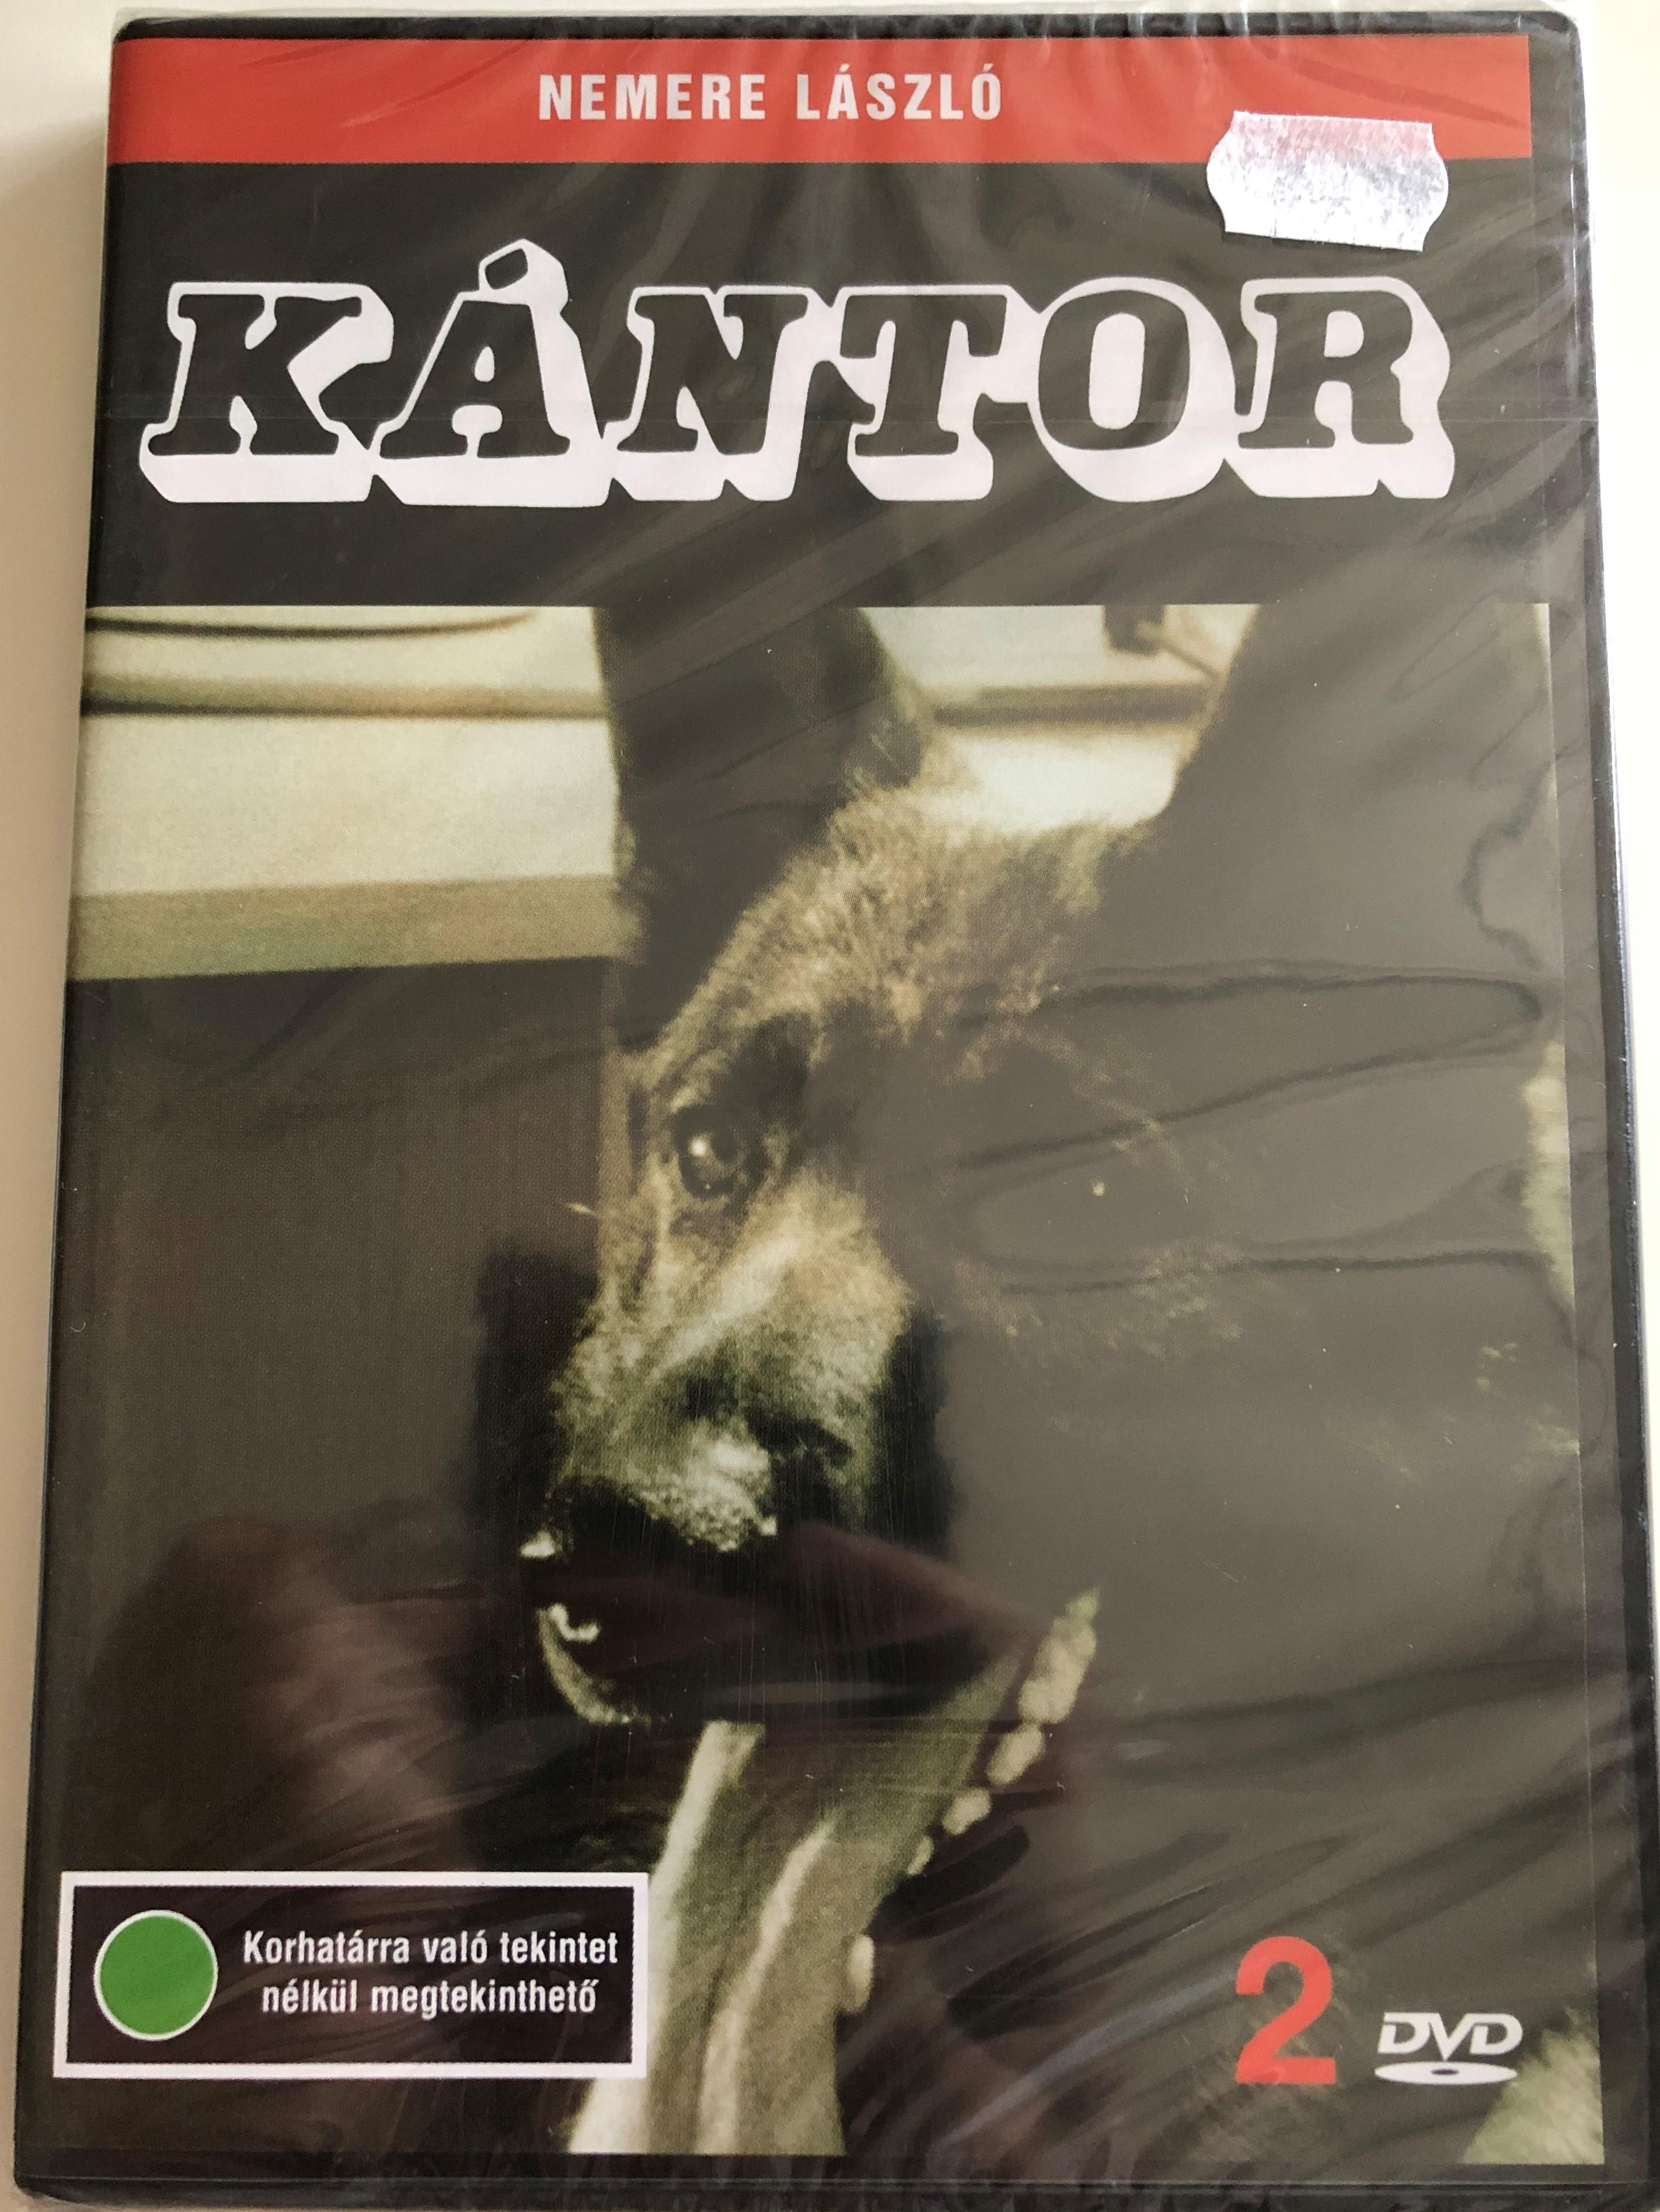 -k-ntor-2.-dvd-1976-directed-by-nemere-l-szl-starring-madaras-j-zsef-szil-gyi-tibor-1-.jpg